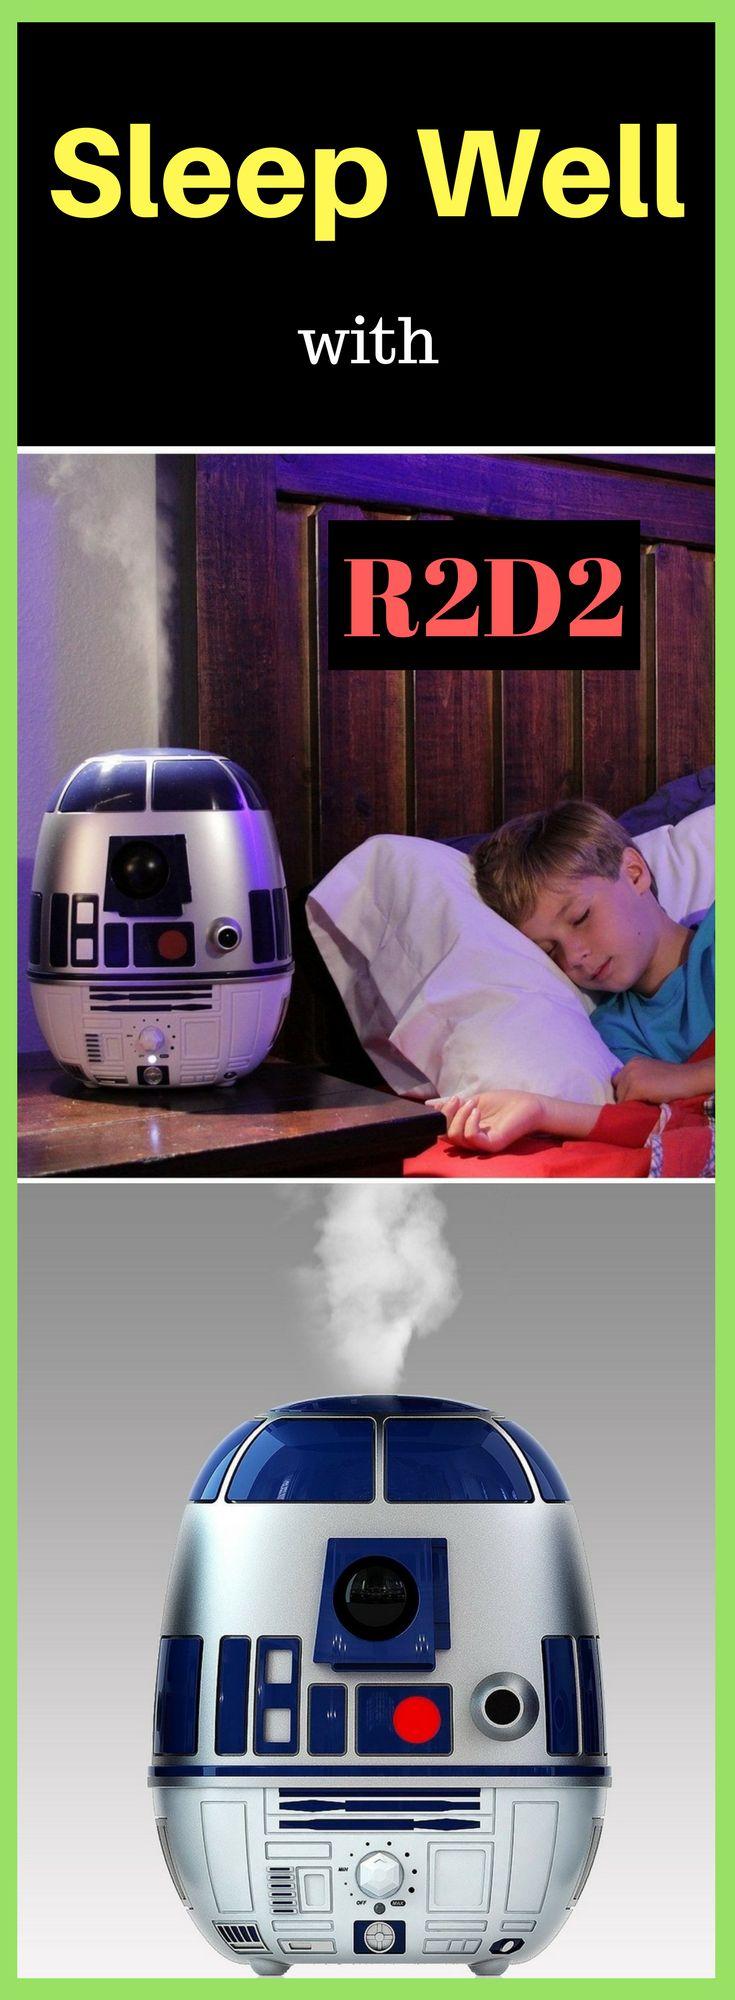 Star Wars R2D2 Ultrasonic Cool-Mist Humidifier #starwars #r2d2 #humidifier #sleep @ https://starwargift.com/product/star-wars-r2d2-ultrasonic-cool-mist-humidifier/